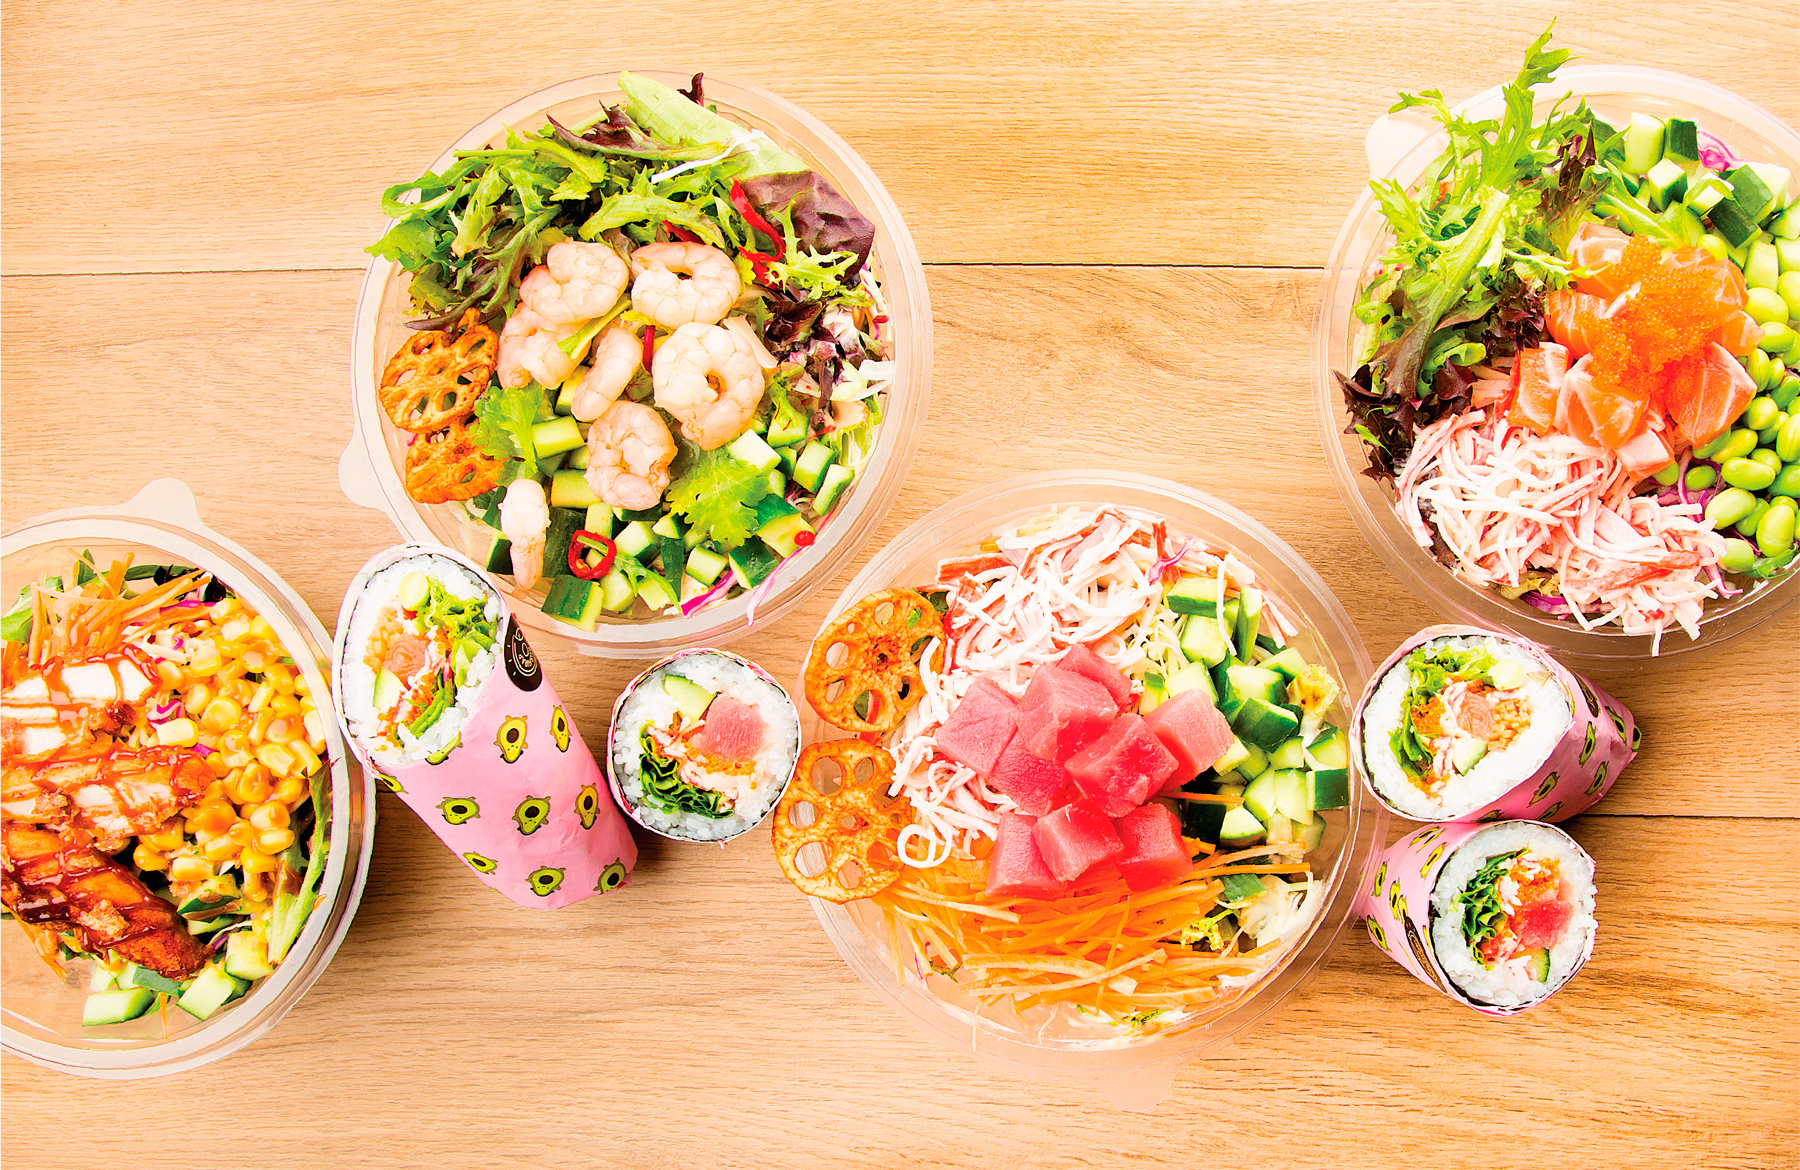 Sushirap-branding-food-photography-design-graphic-designer-sydney-5